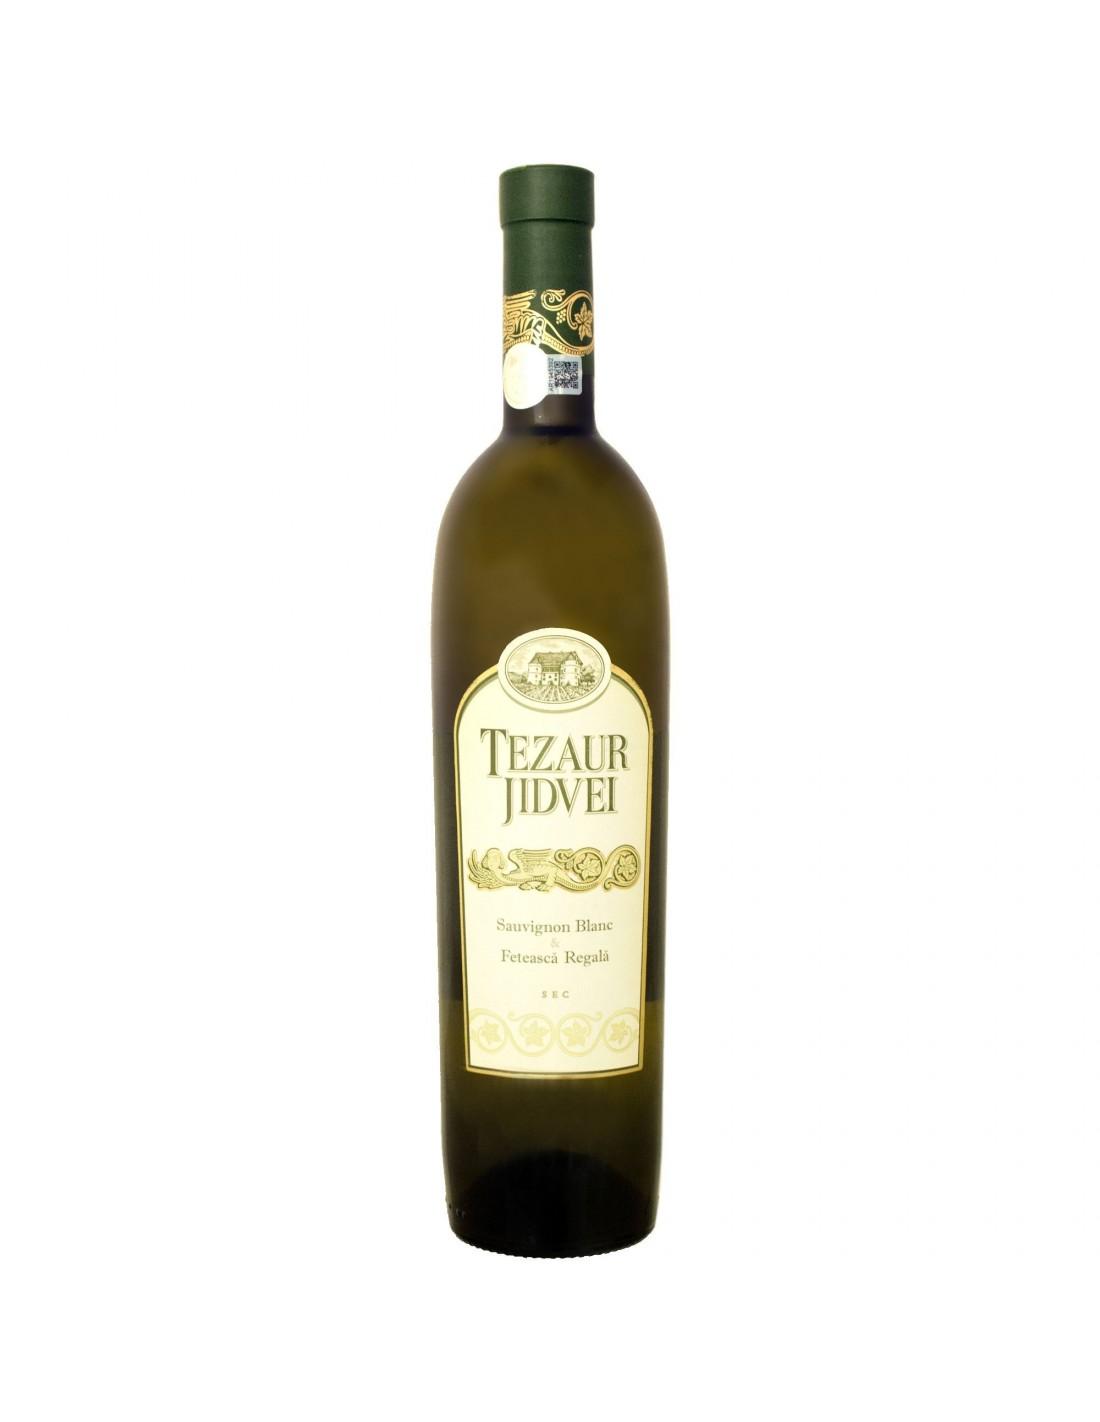 Vin alb sec, Cupaj, Tezaur, 0.75L, 12.5% alc., Romania